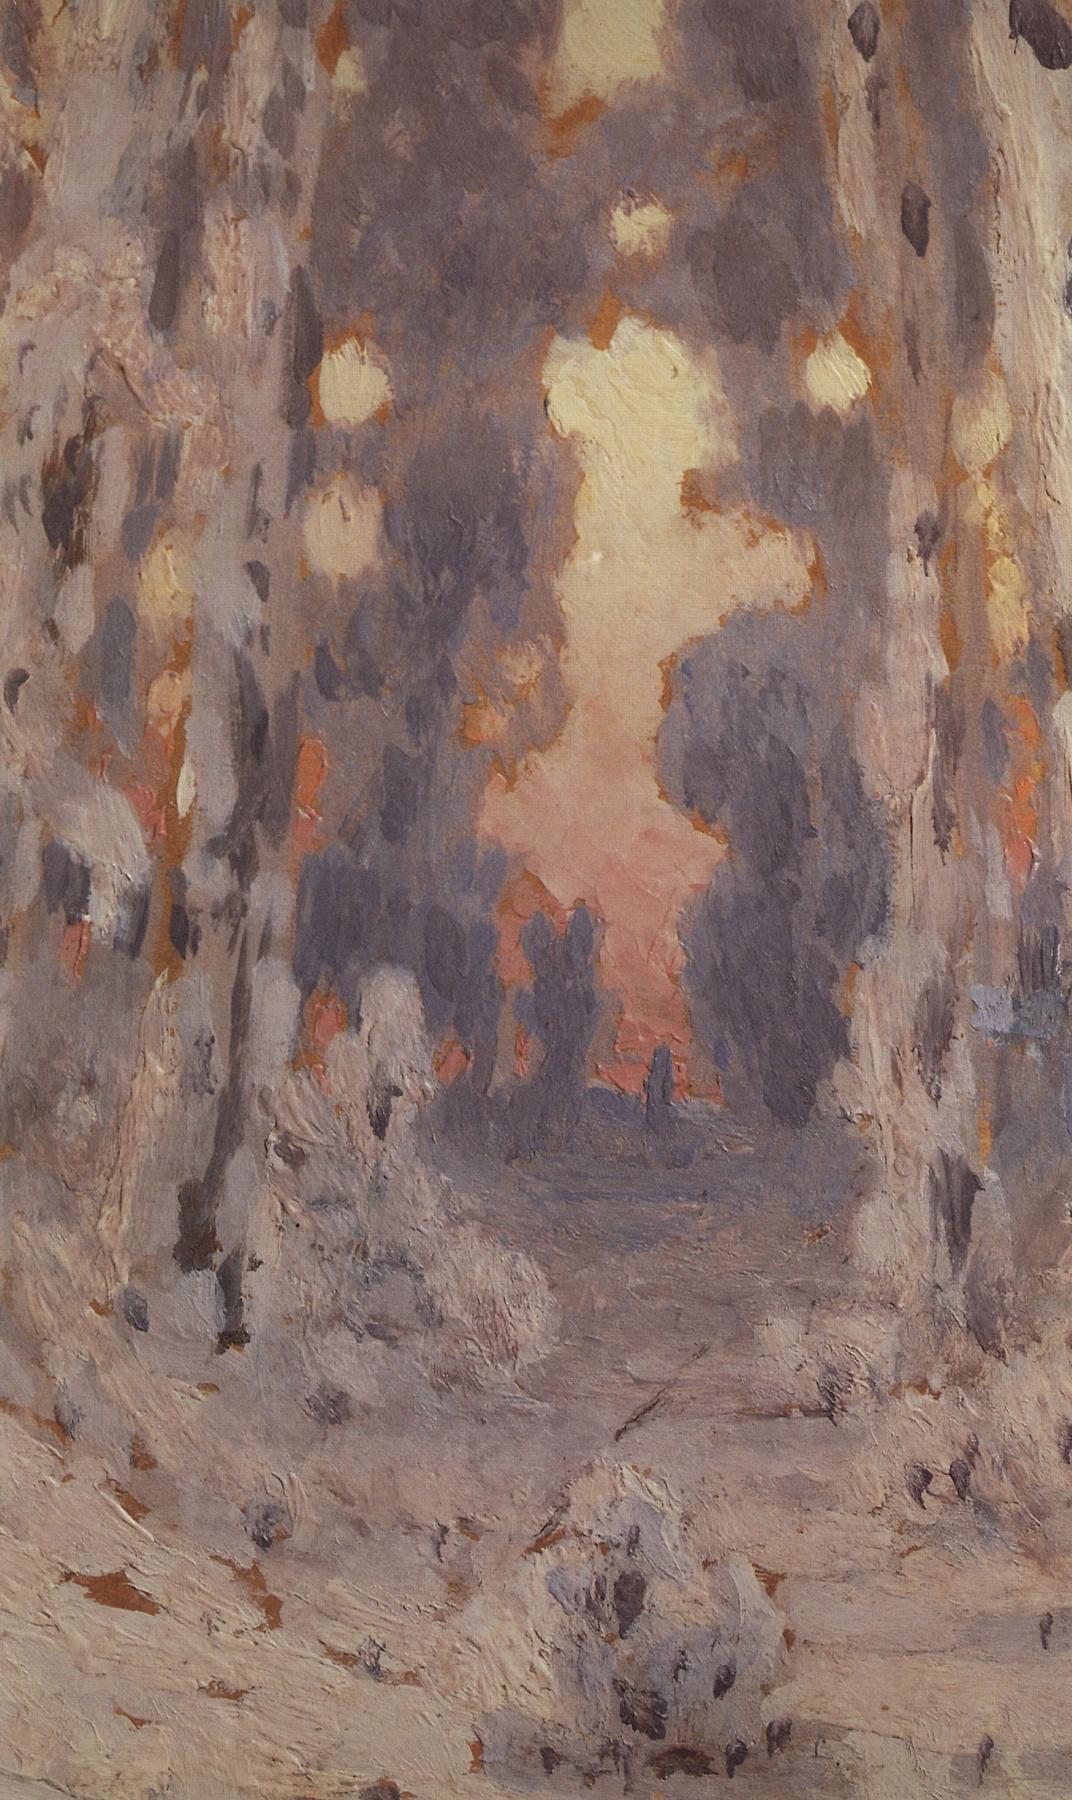 Arkhip Ivanovich Kuindzhi. Sun spots on hoarfrost. Sunset in the forest